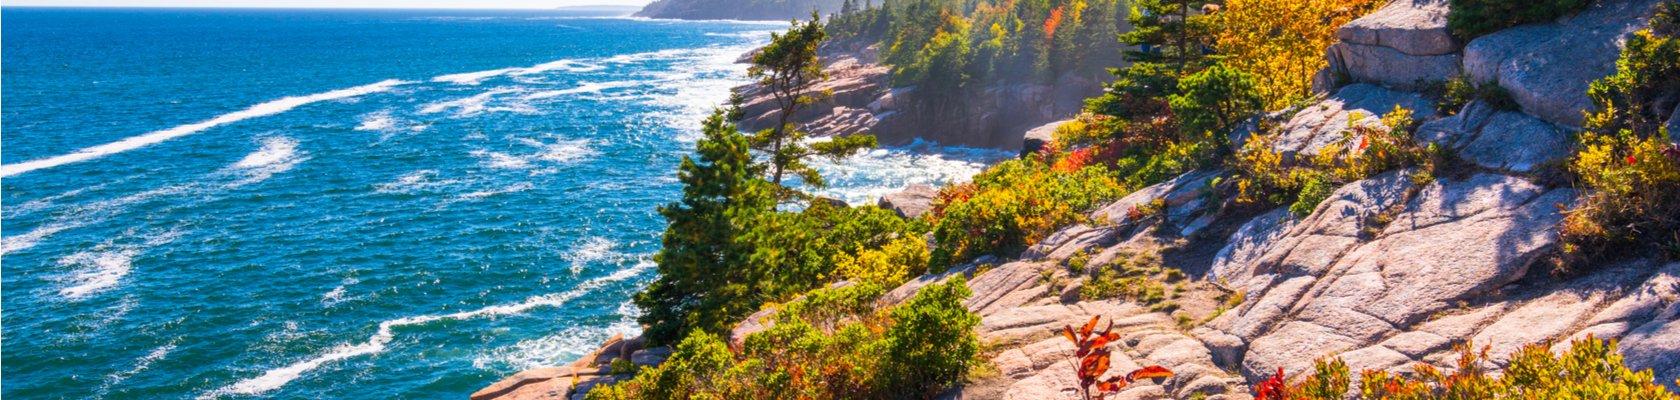 Acadia Nationaal Park